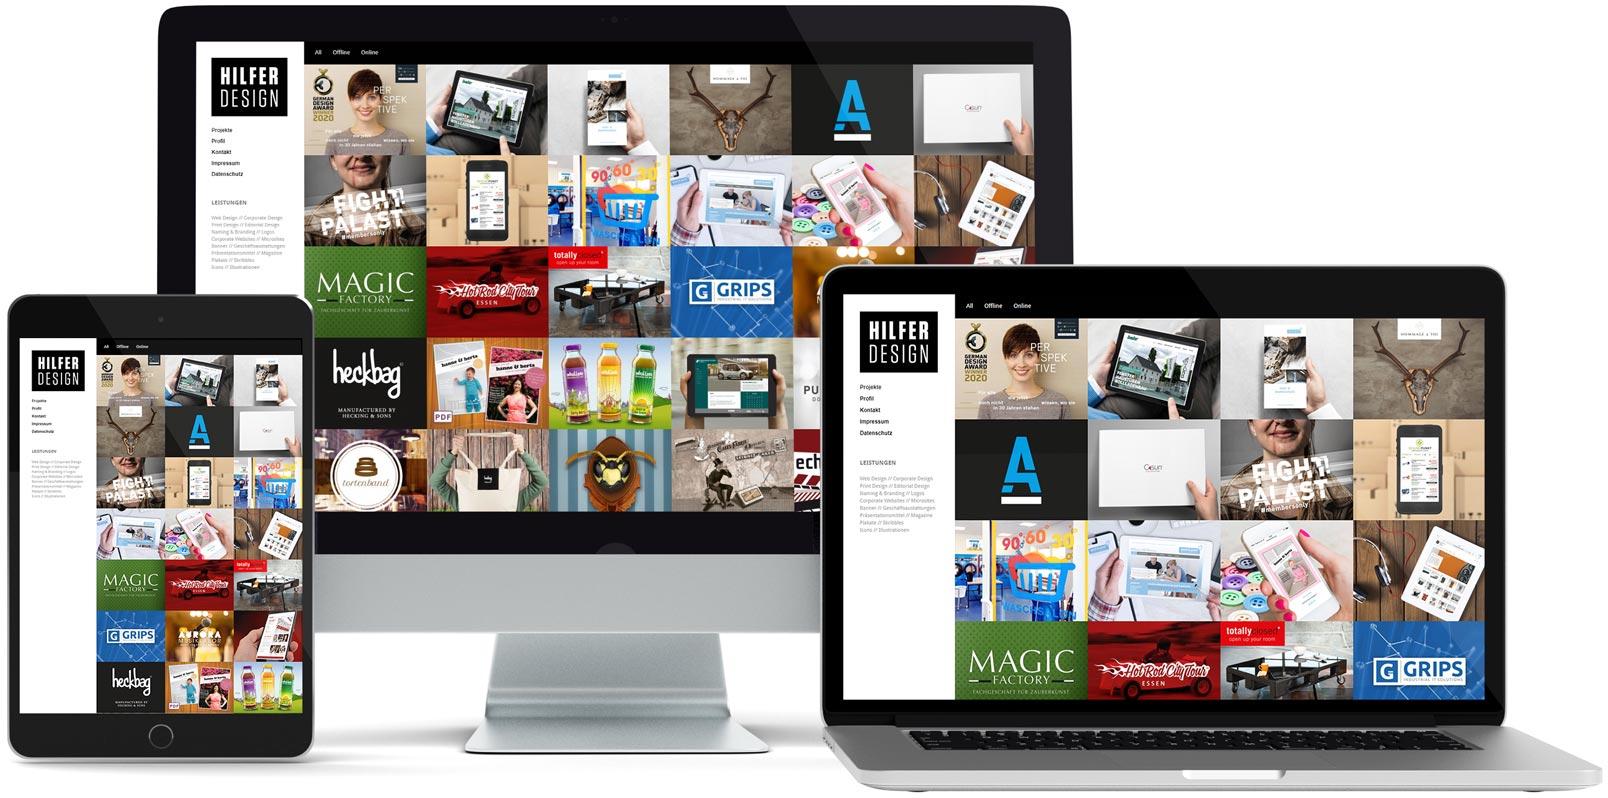 WordPress Webdesign: Hilfer Design